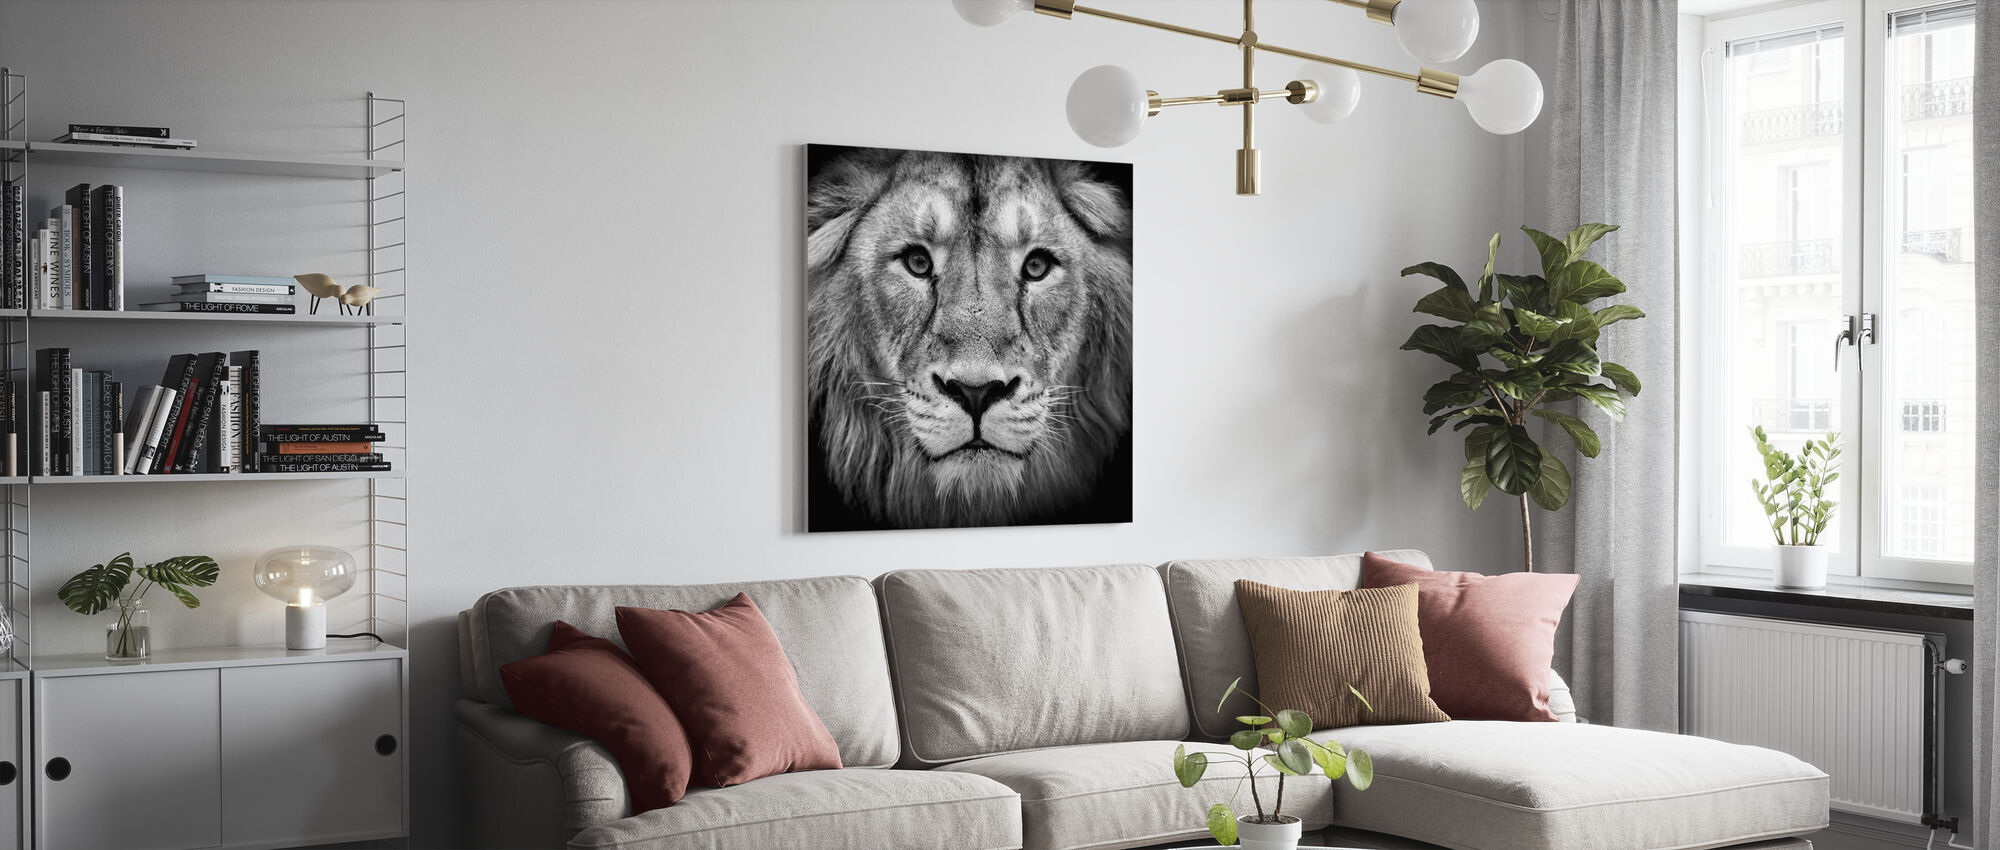 Wise Lion, svart och vitt - Canvastavla - Vardagsrum